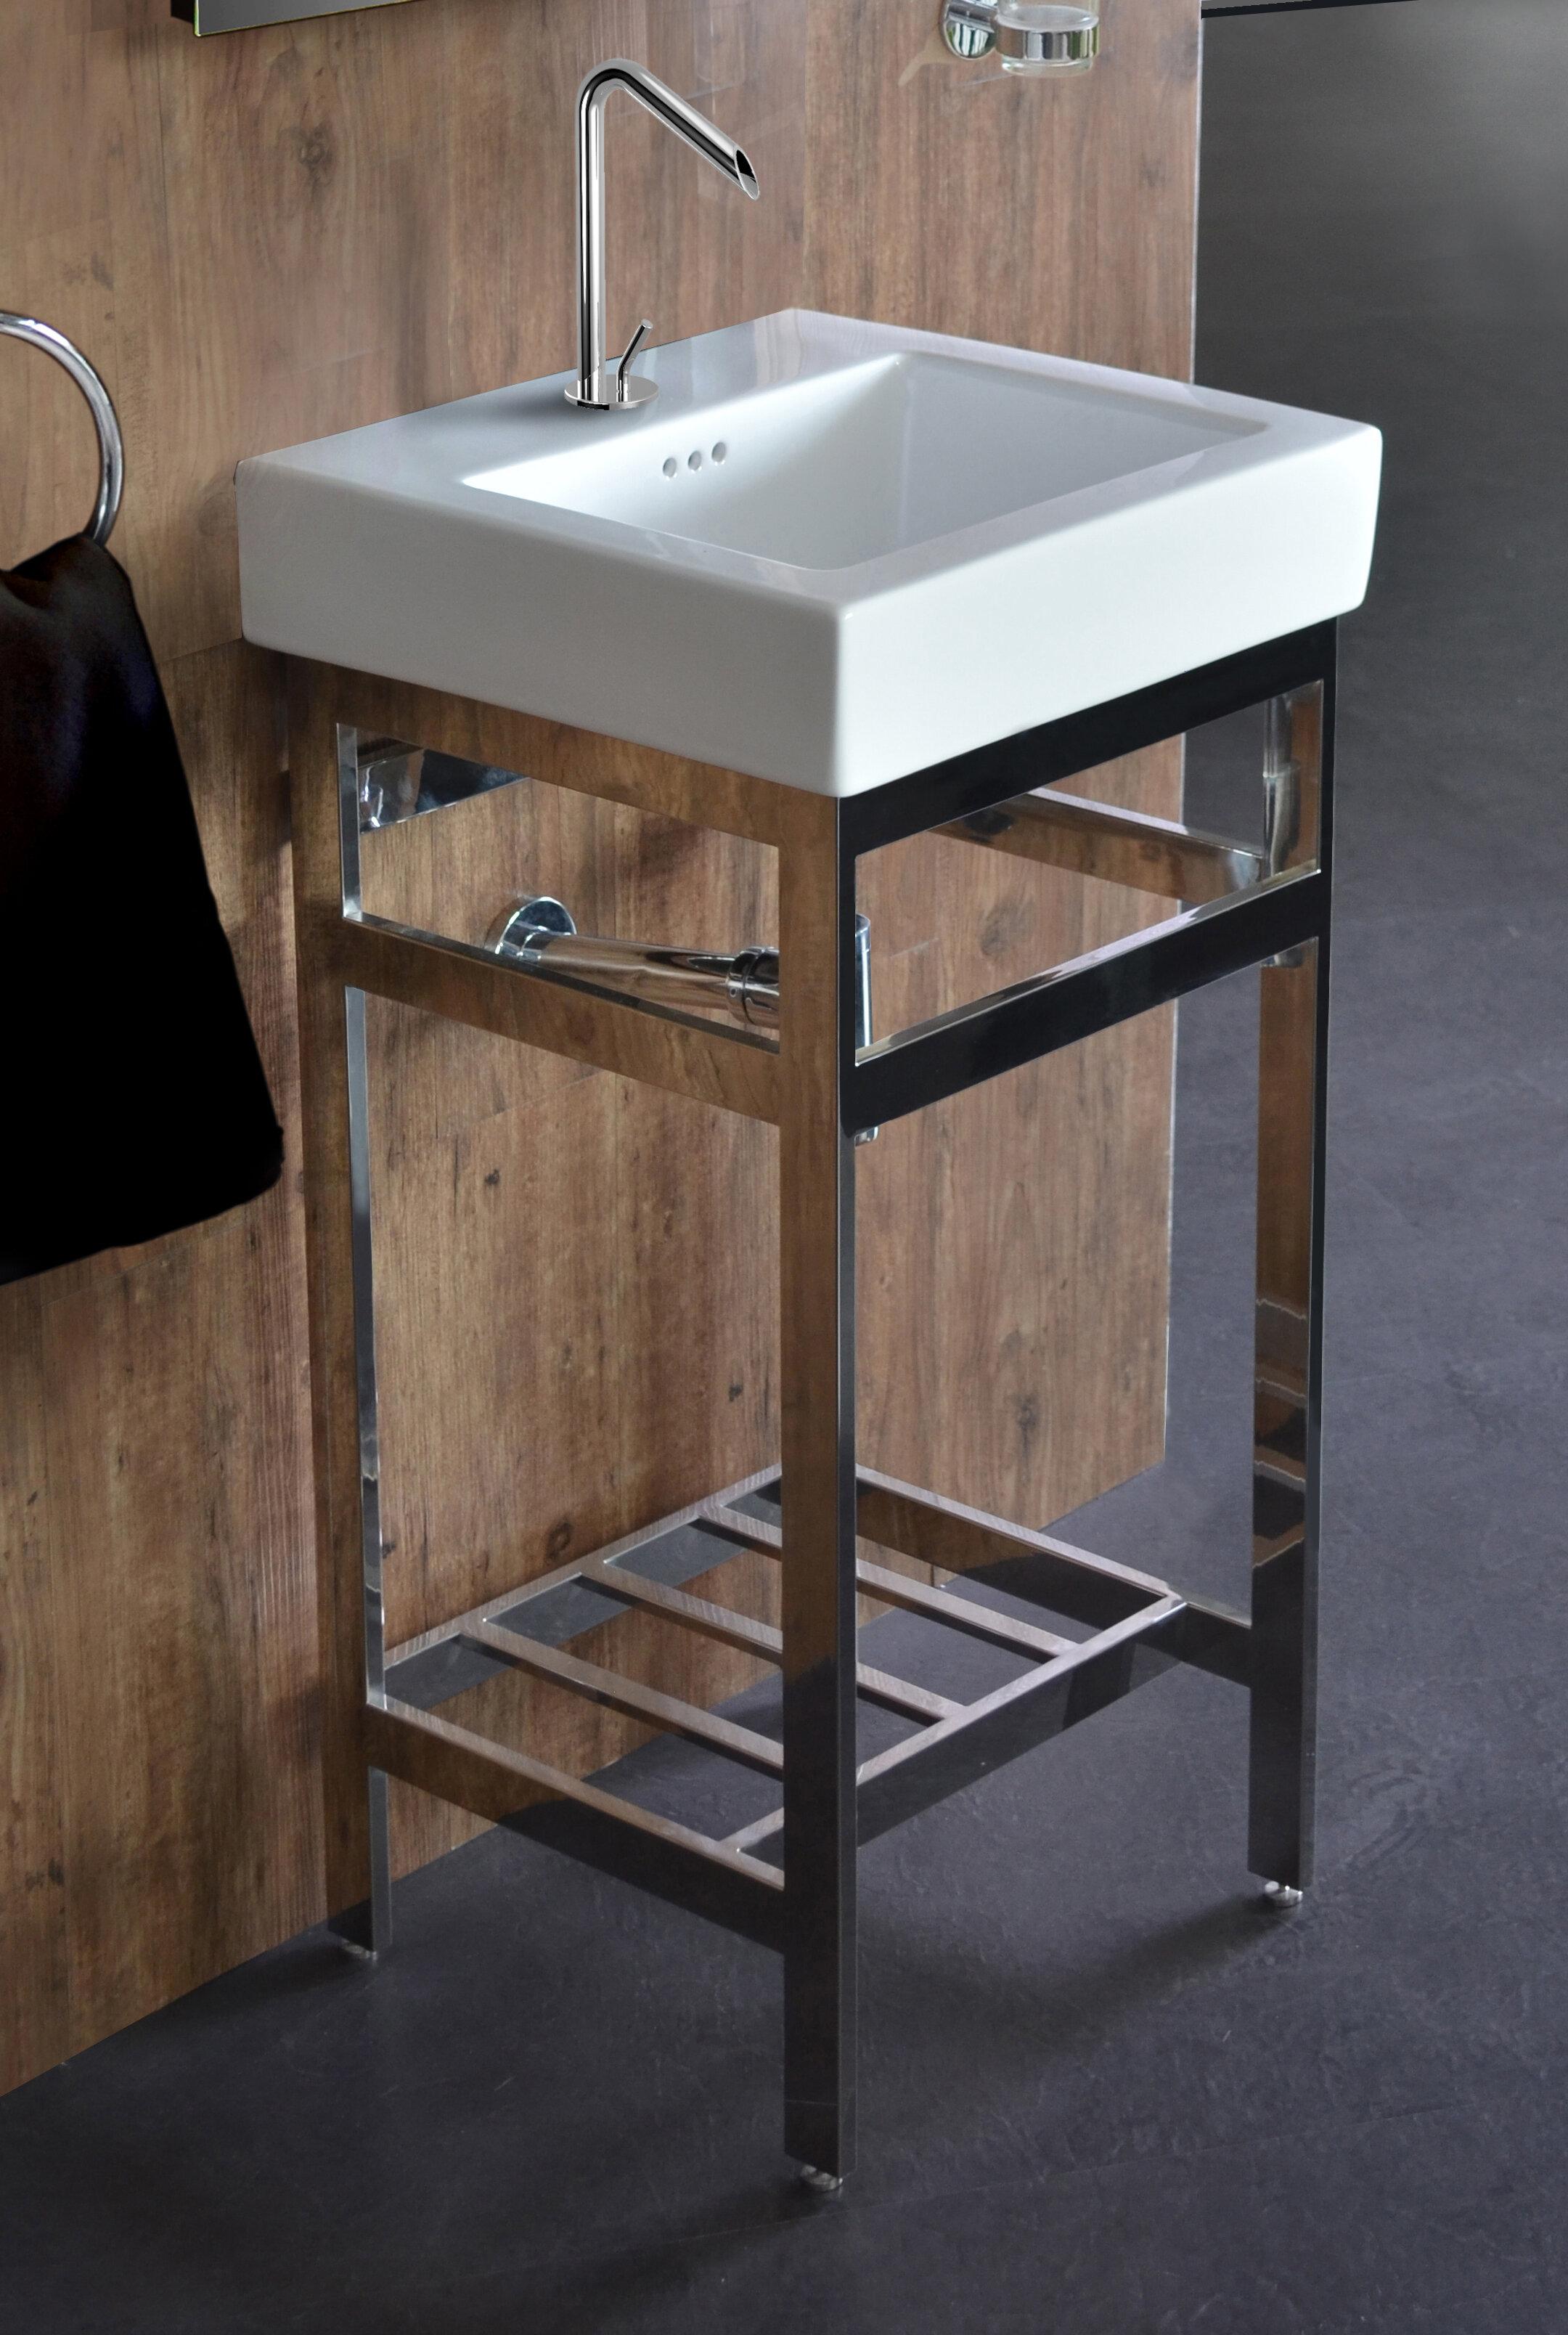 Ivy Bronx Arverne Stainless Steel Open Console 18 Single Bathroom Vanity Set Wayfair